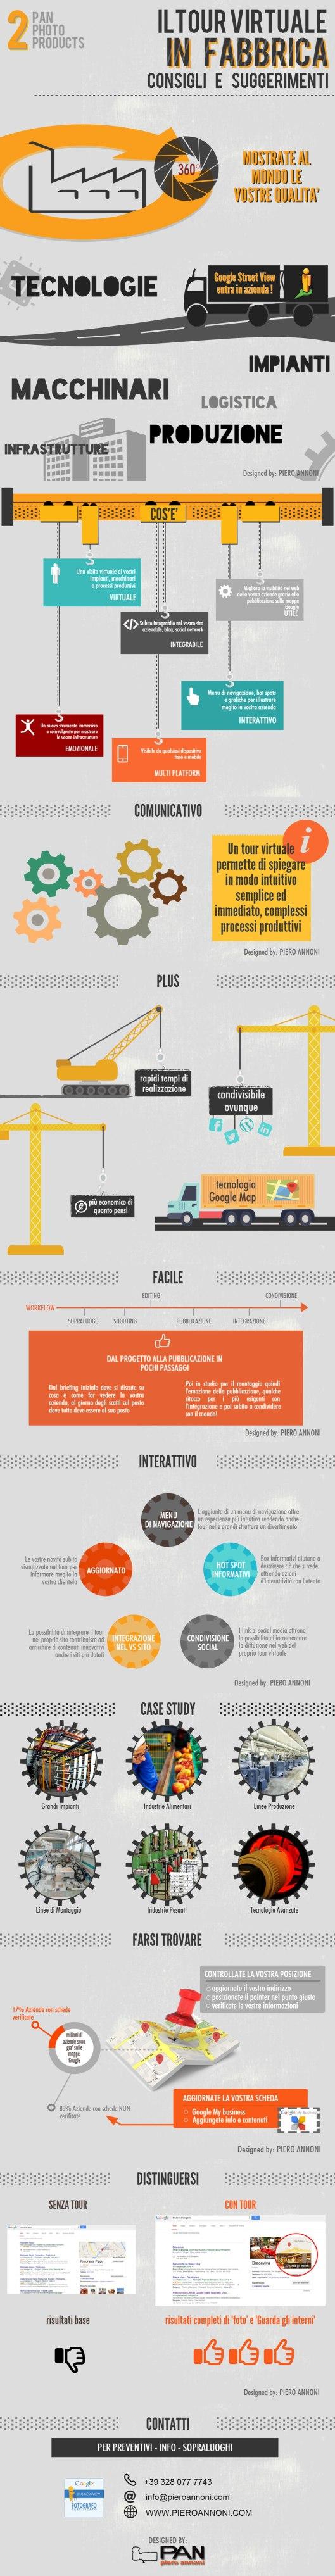 Tour Virtuali in Fabbrica - infografica